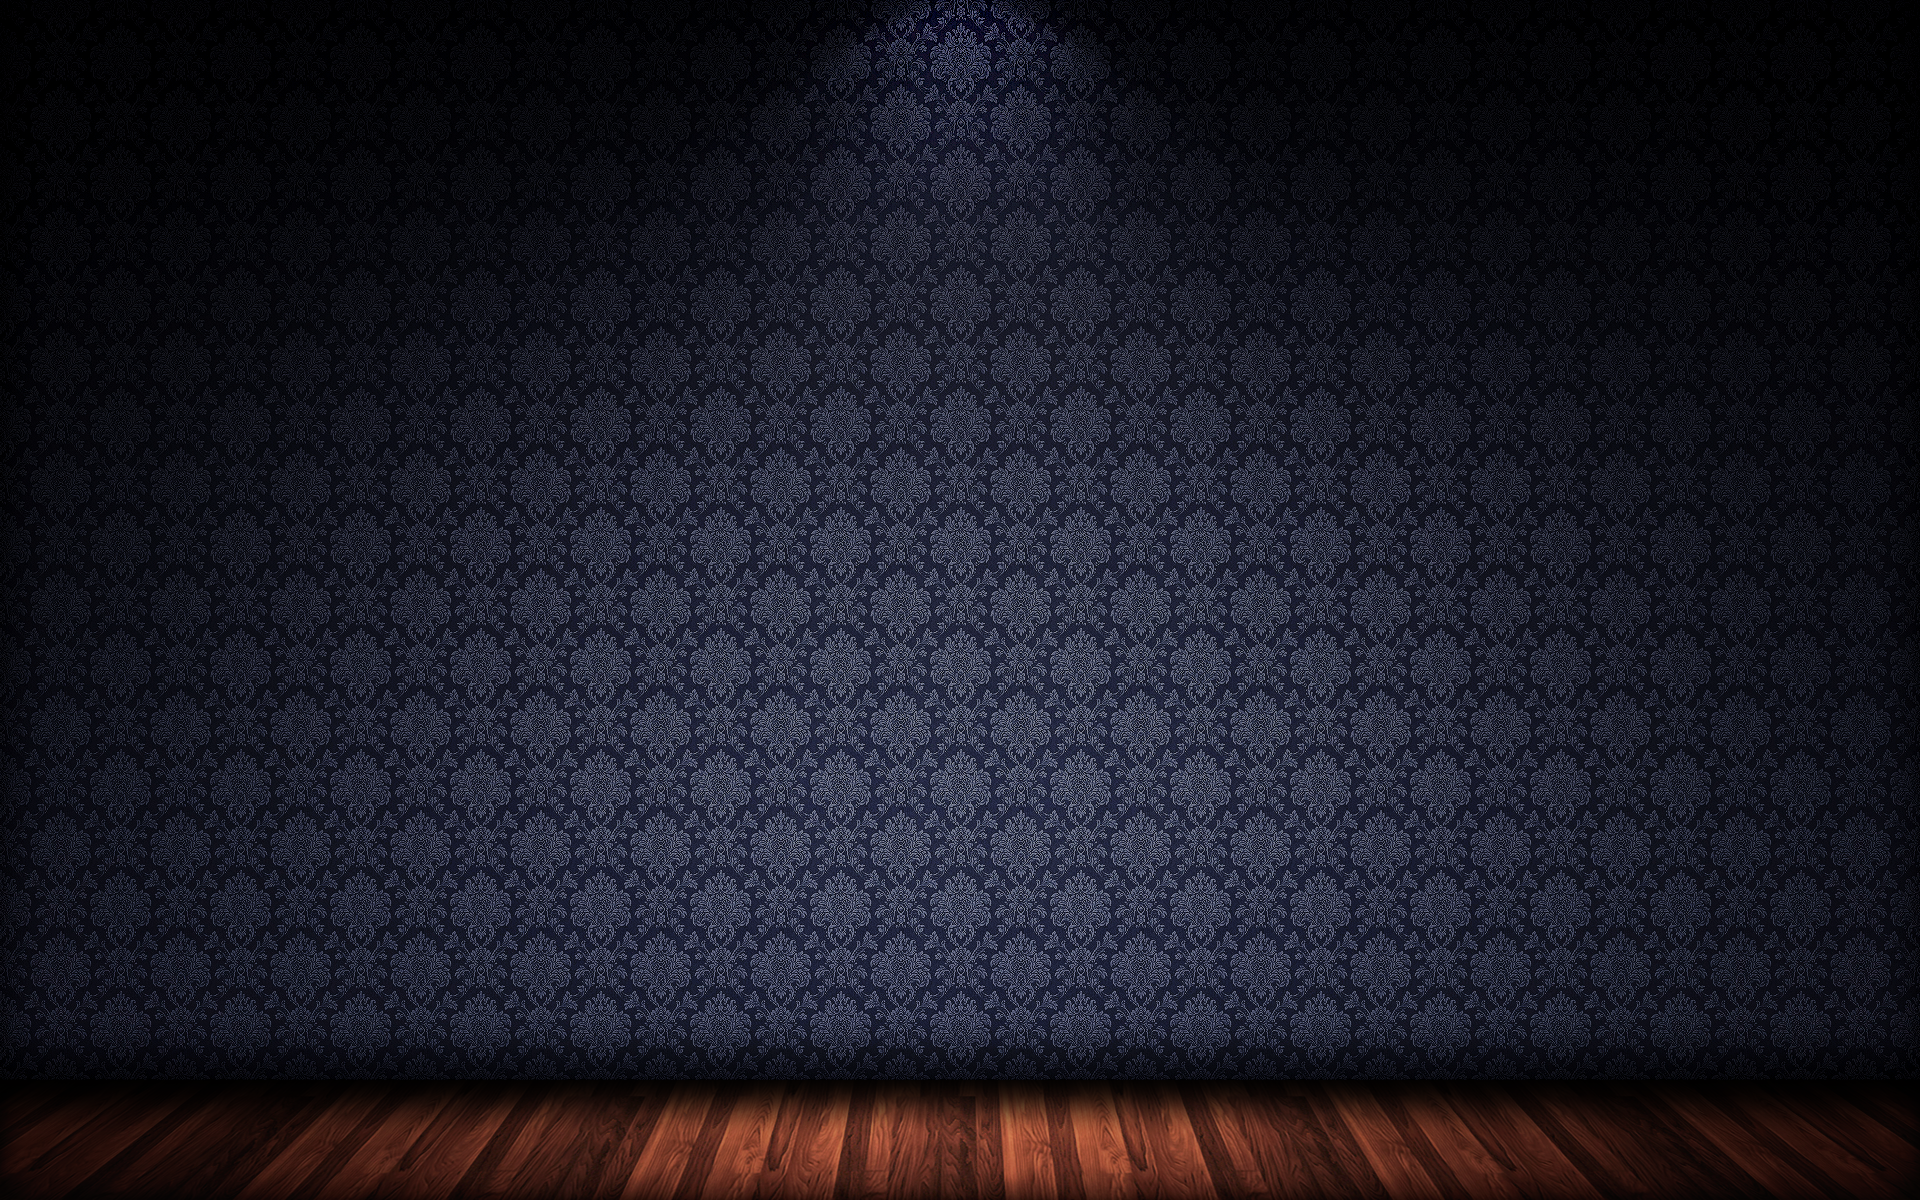 Floor 3d view minimalistic wall room patterns wood floor wallpaper 1920x1200